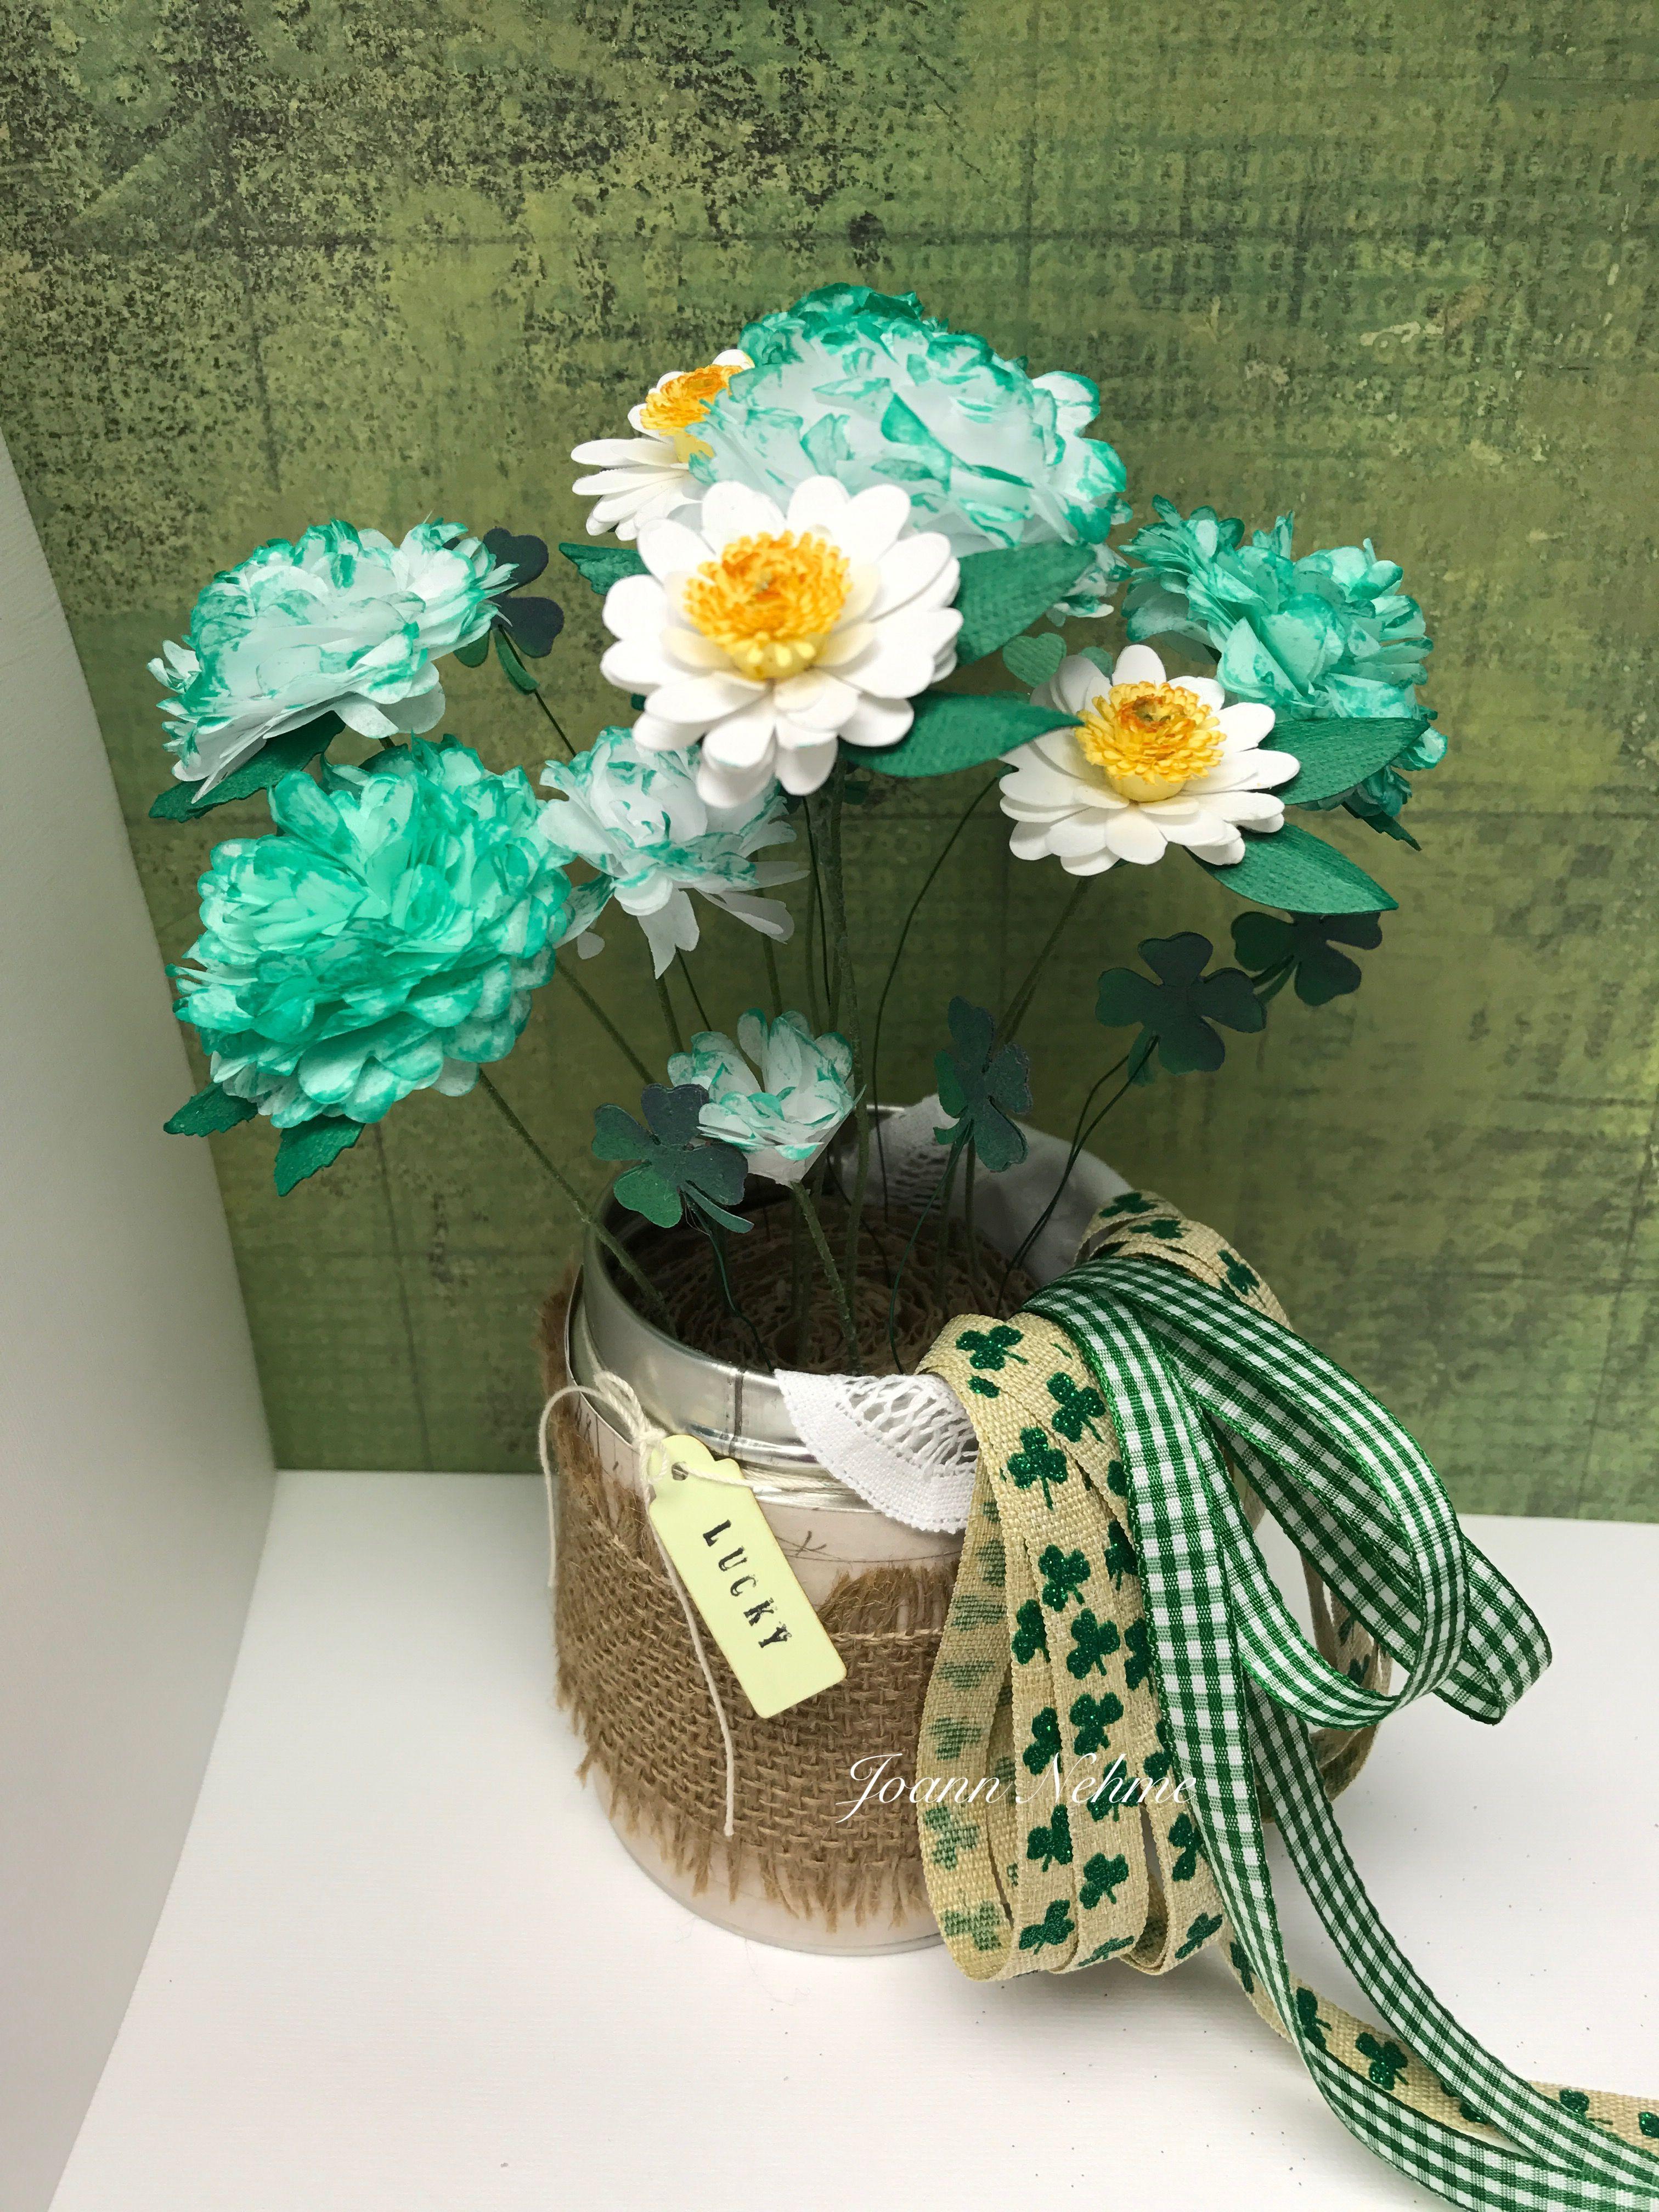 Saint Patrickus day  flowers tissue paper flowers